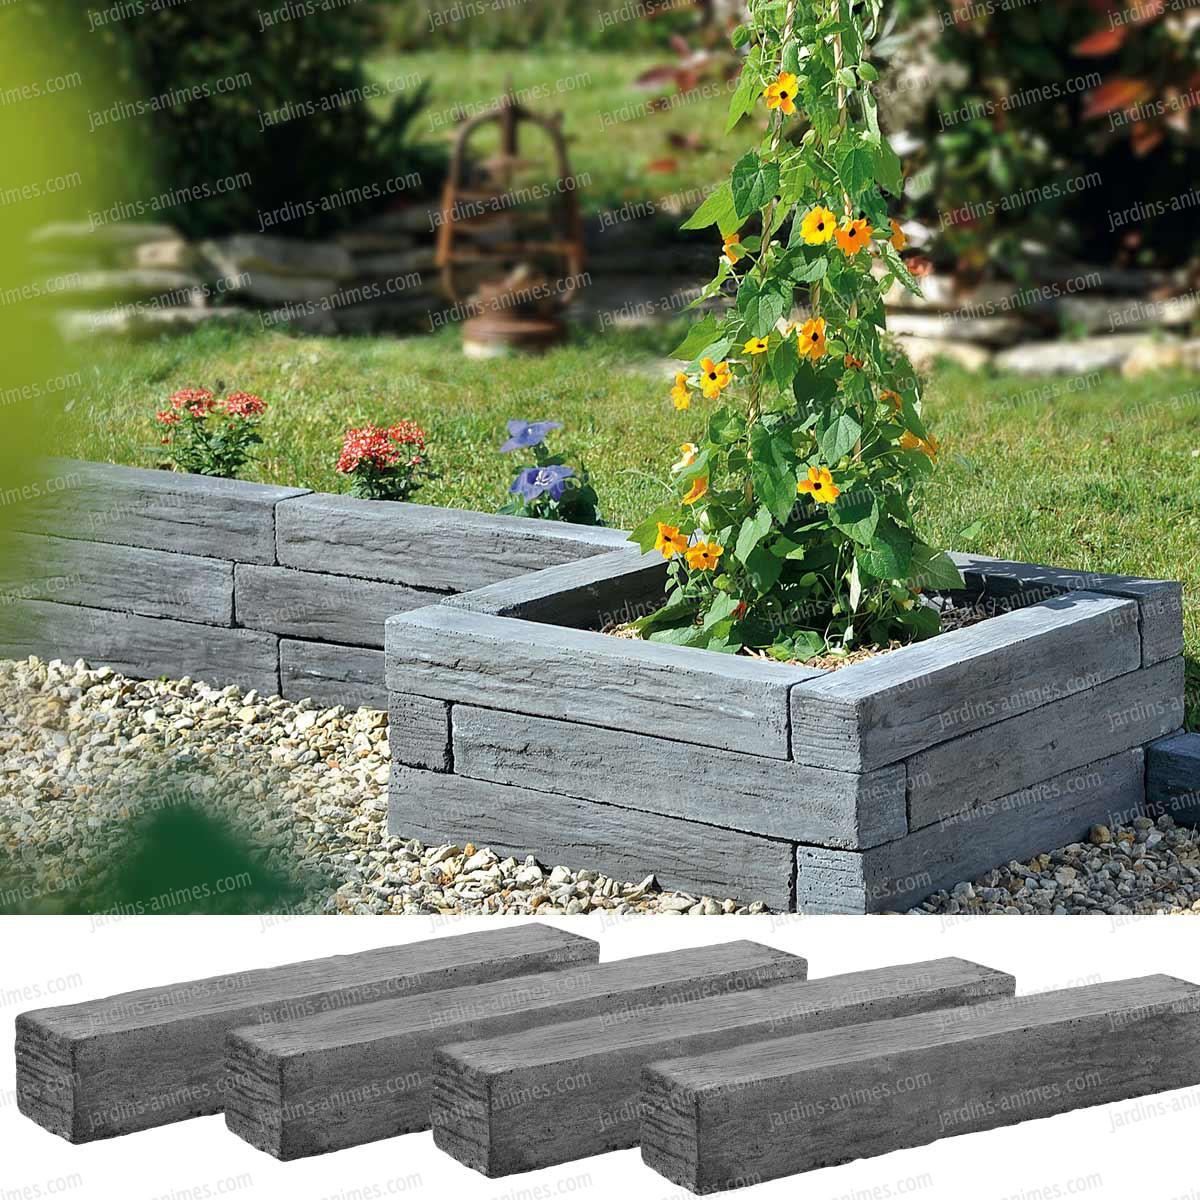 12 bordures en beton imitation ardoise